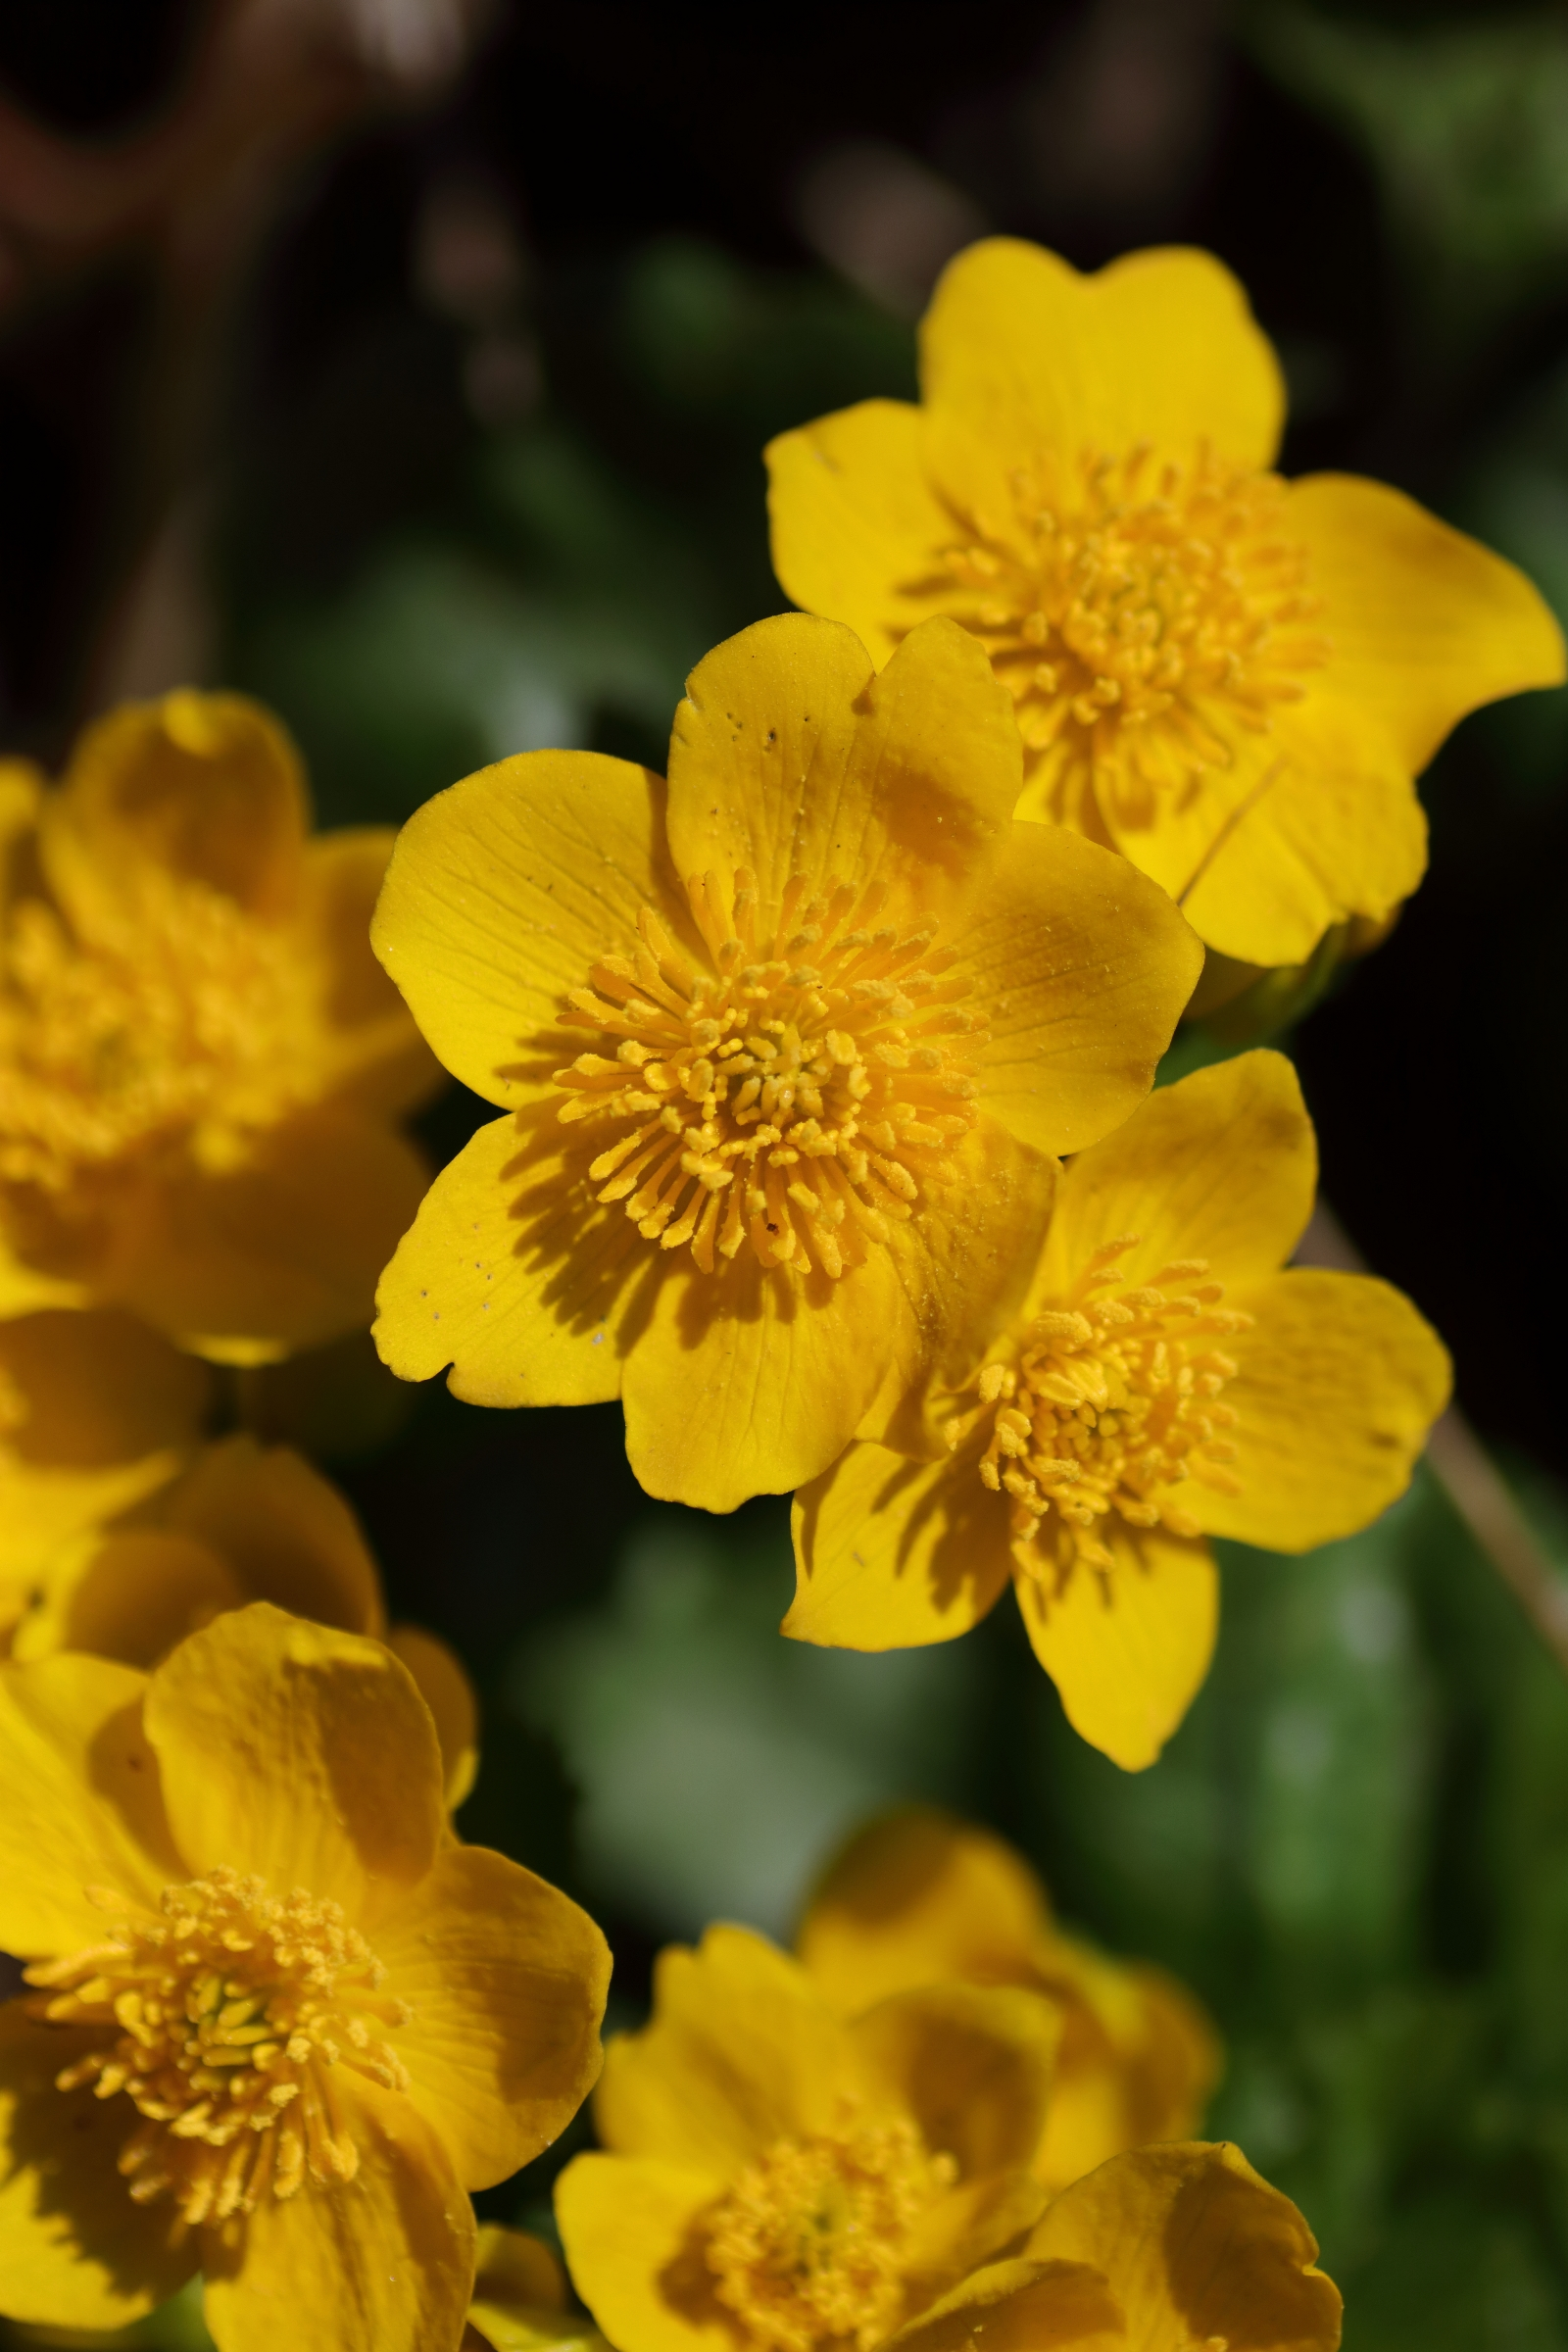 Sumpfdotterblume - Blüte im Detail